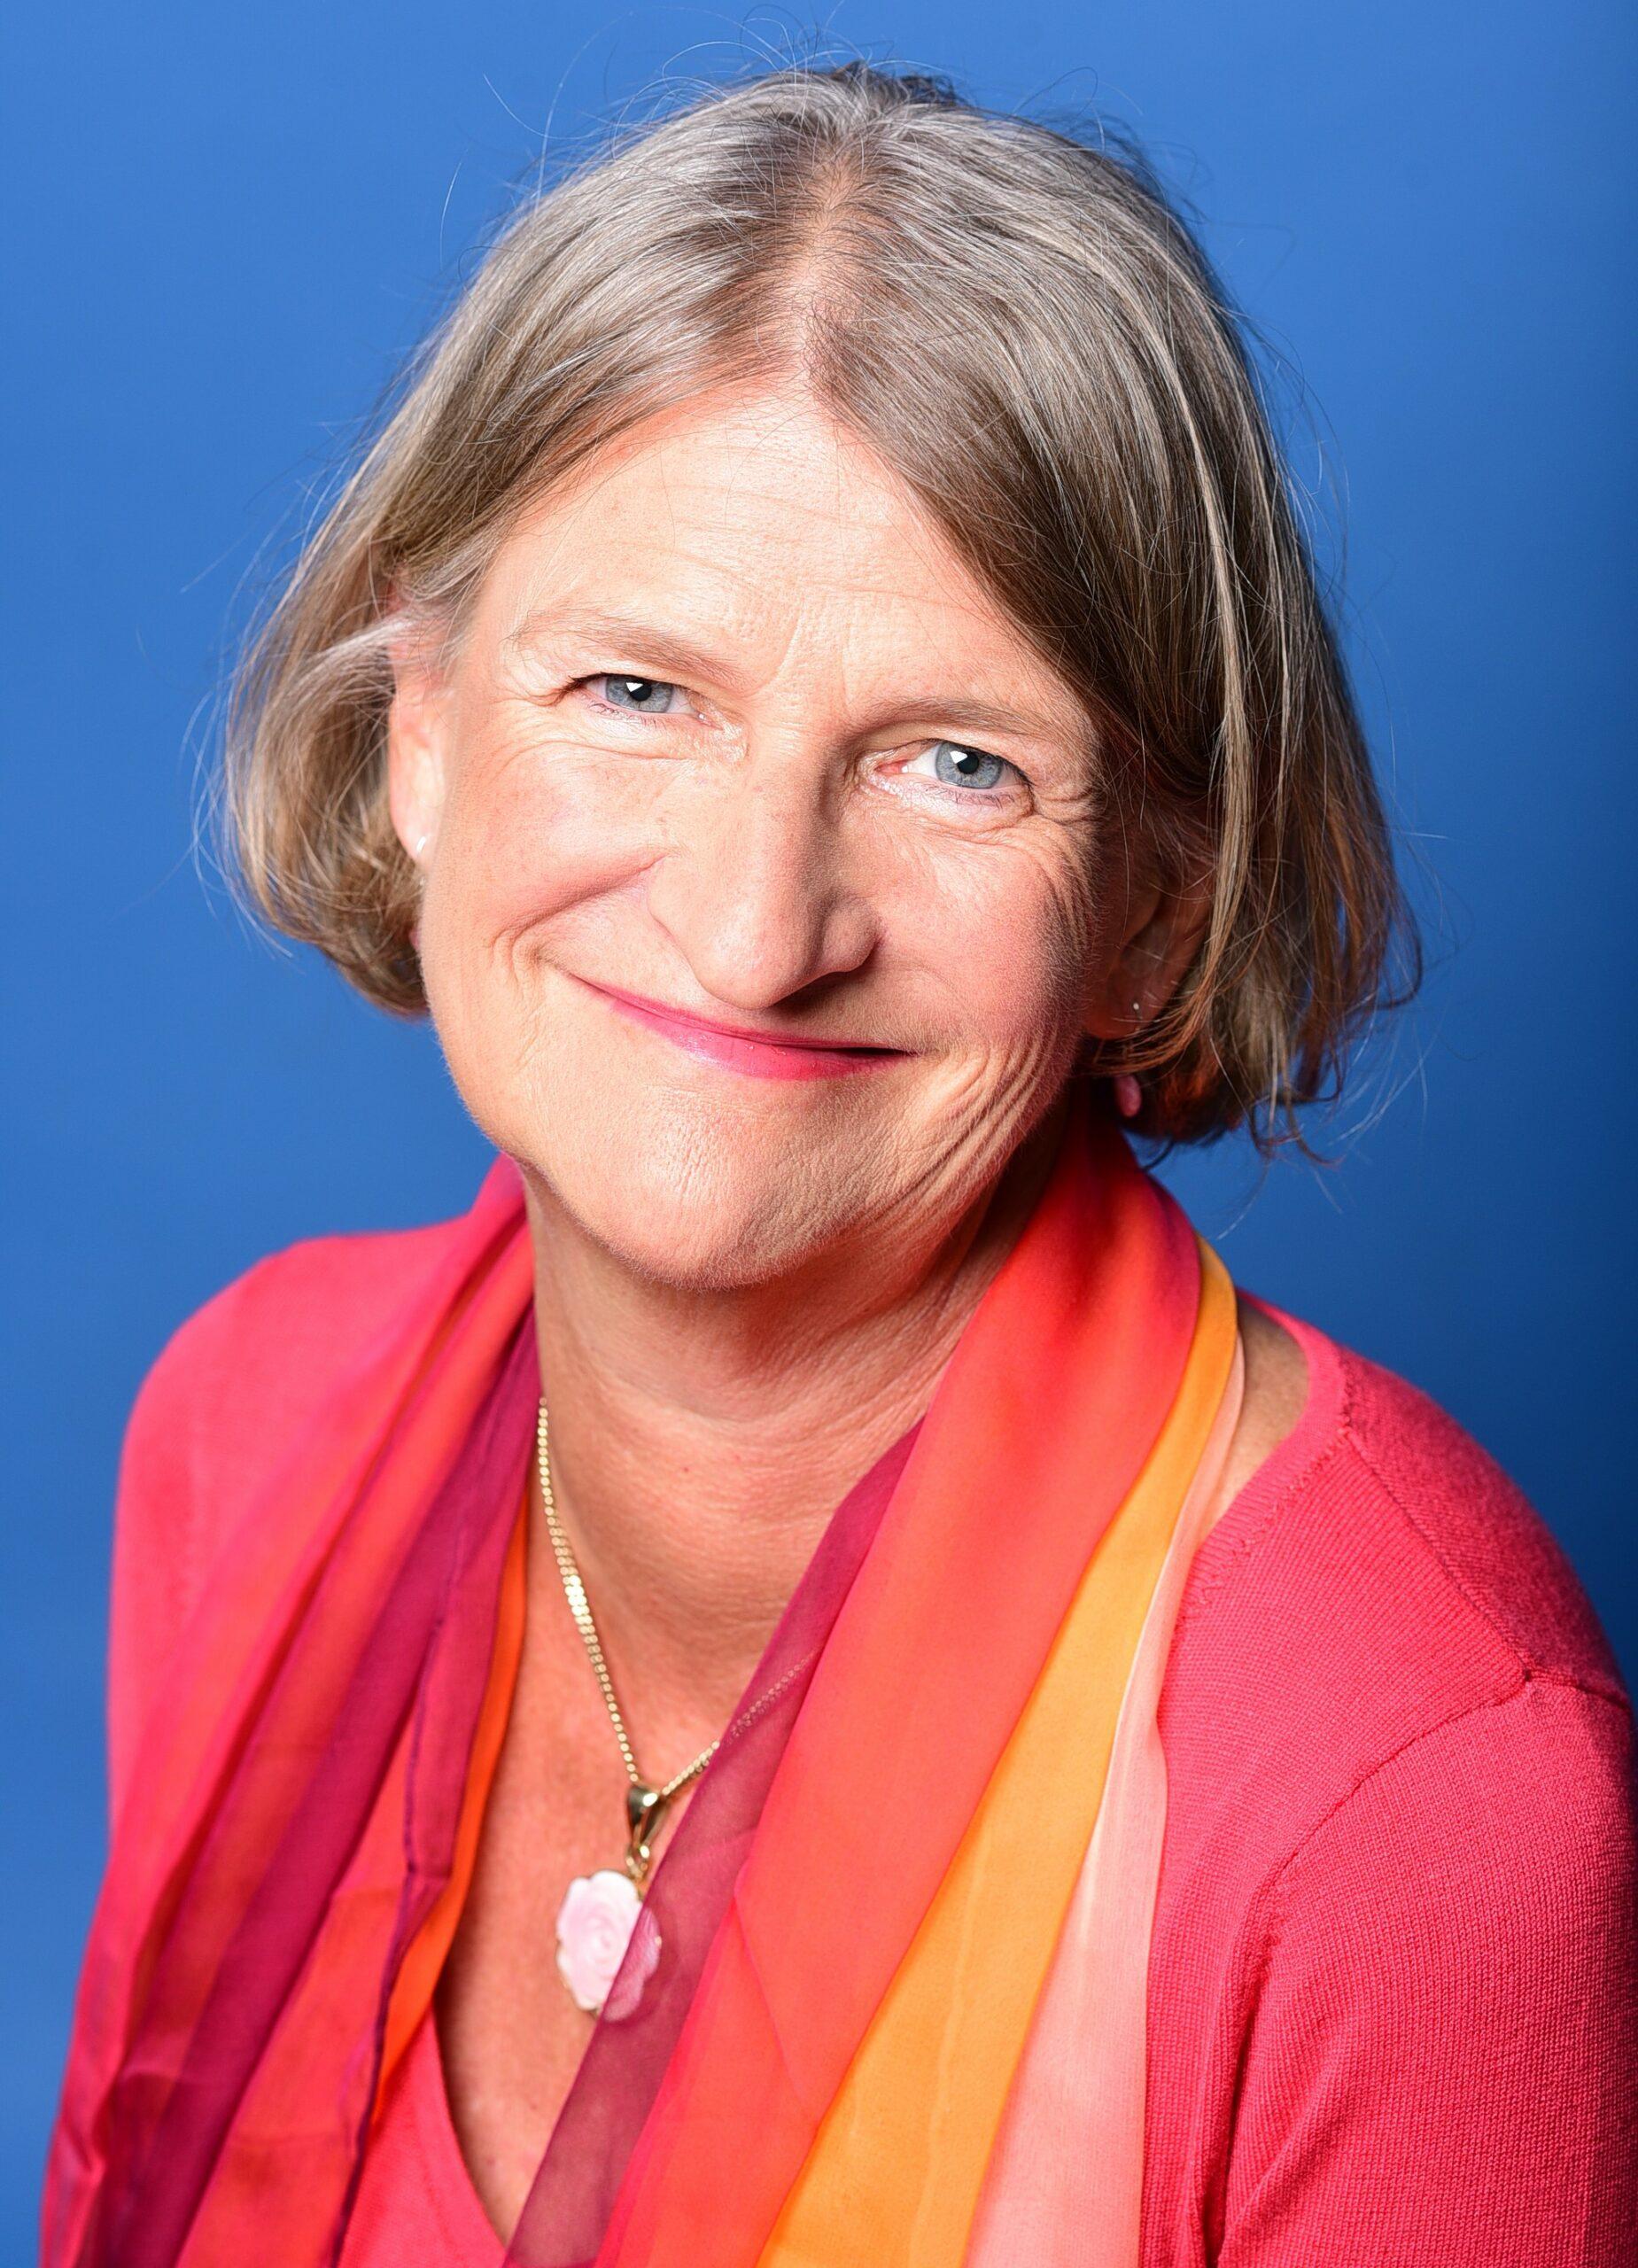 Elisabeth-Westermann